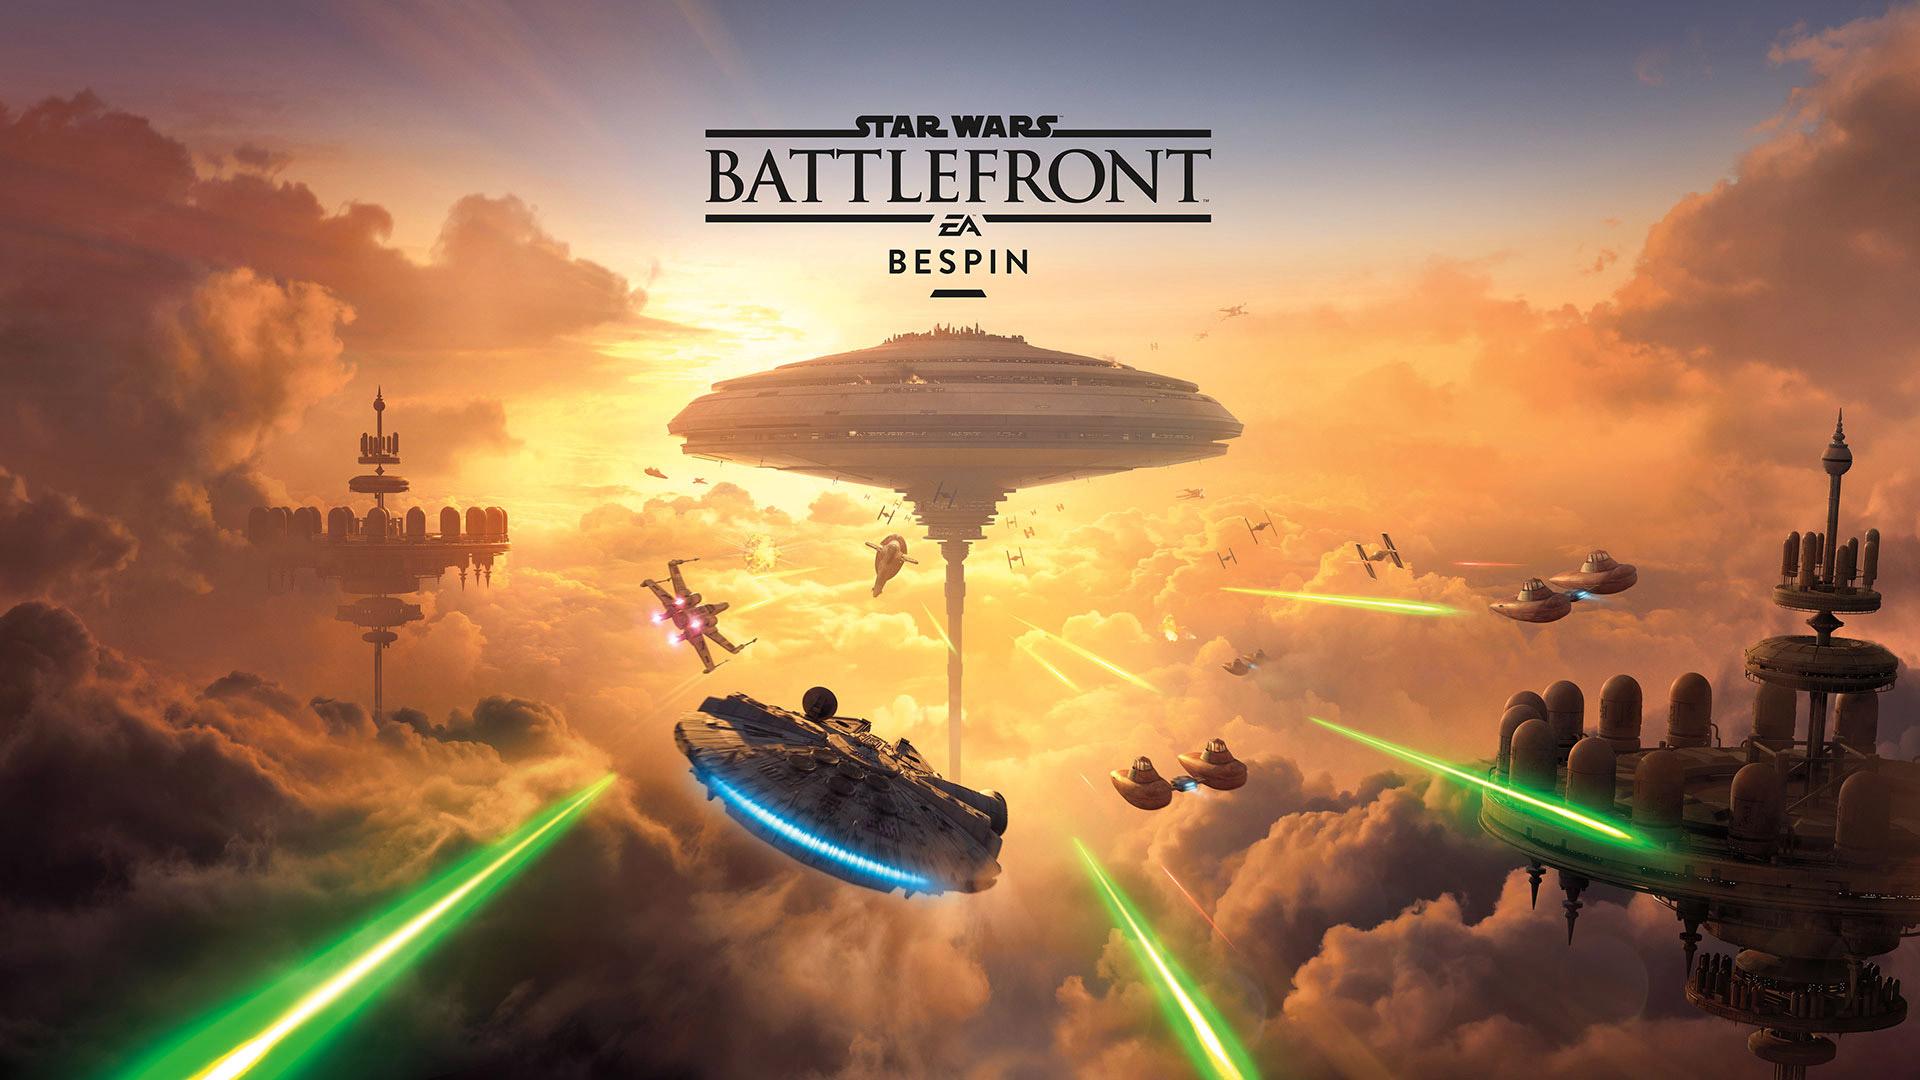 Free Star Wars: Battlefront Wallpaper in 1920x1080